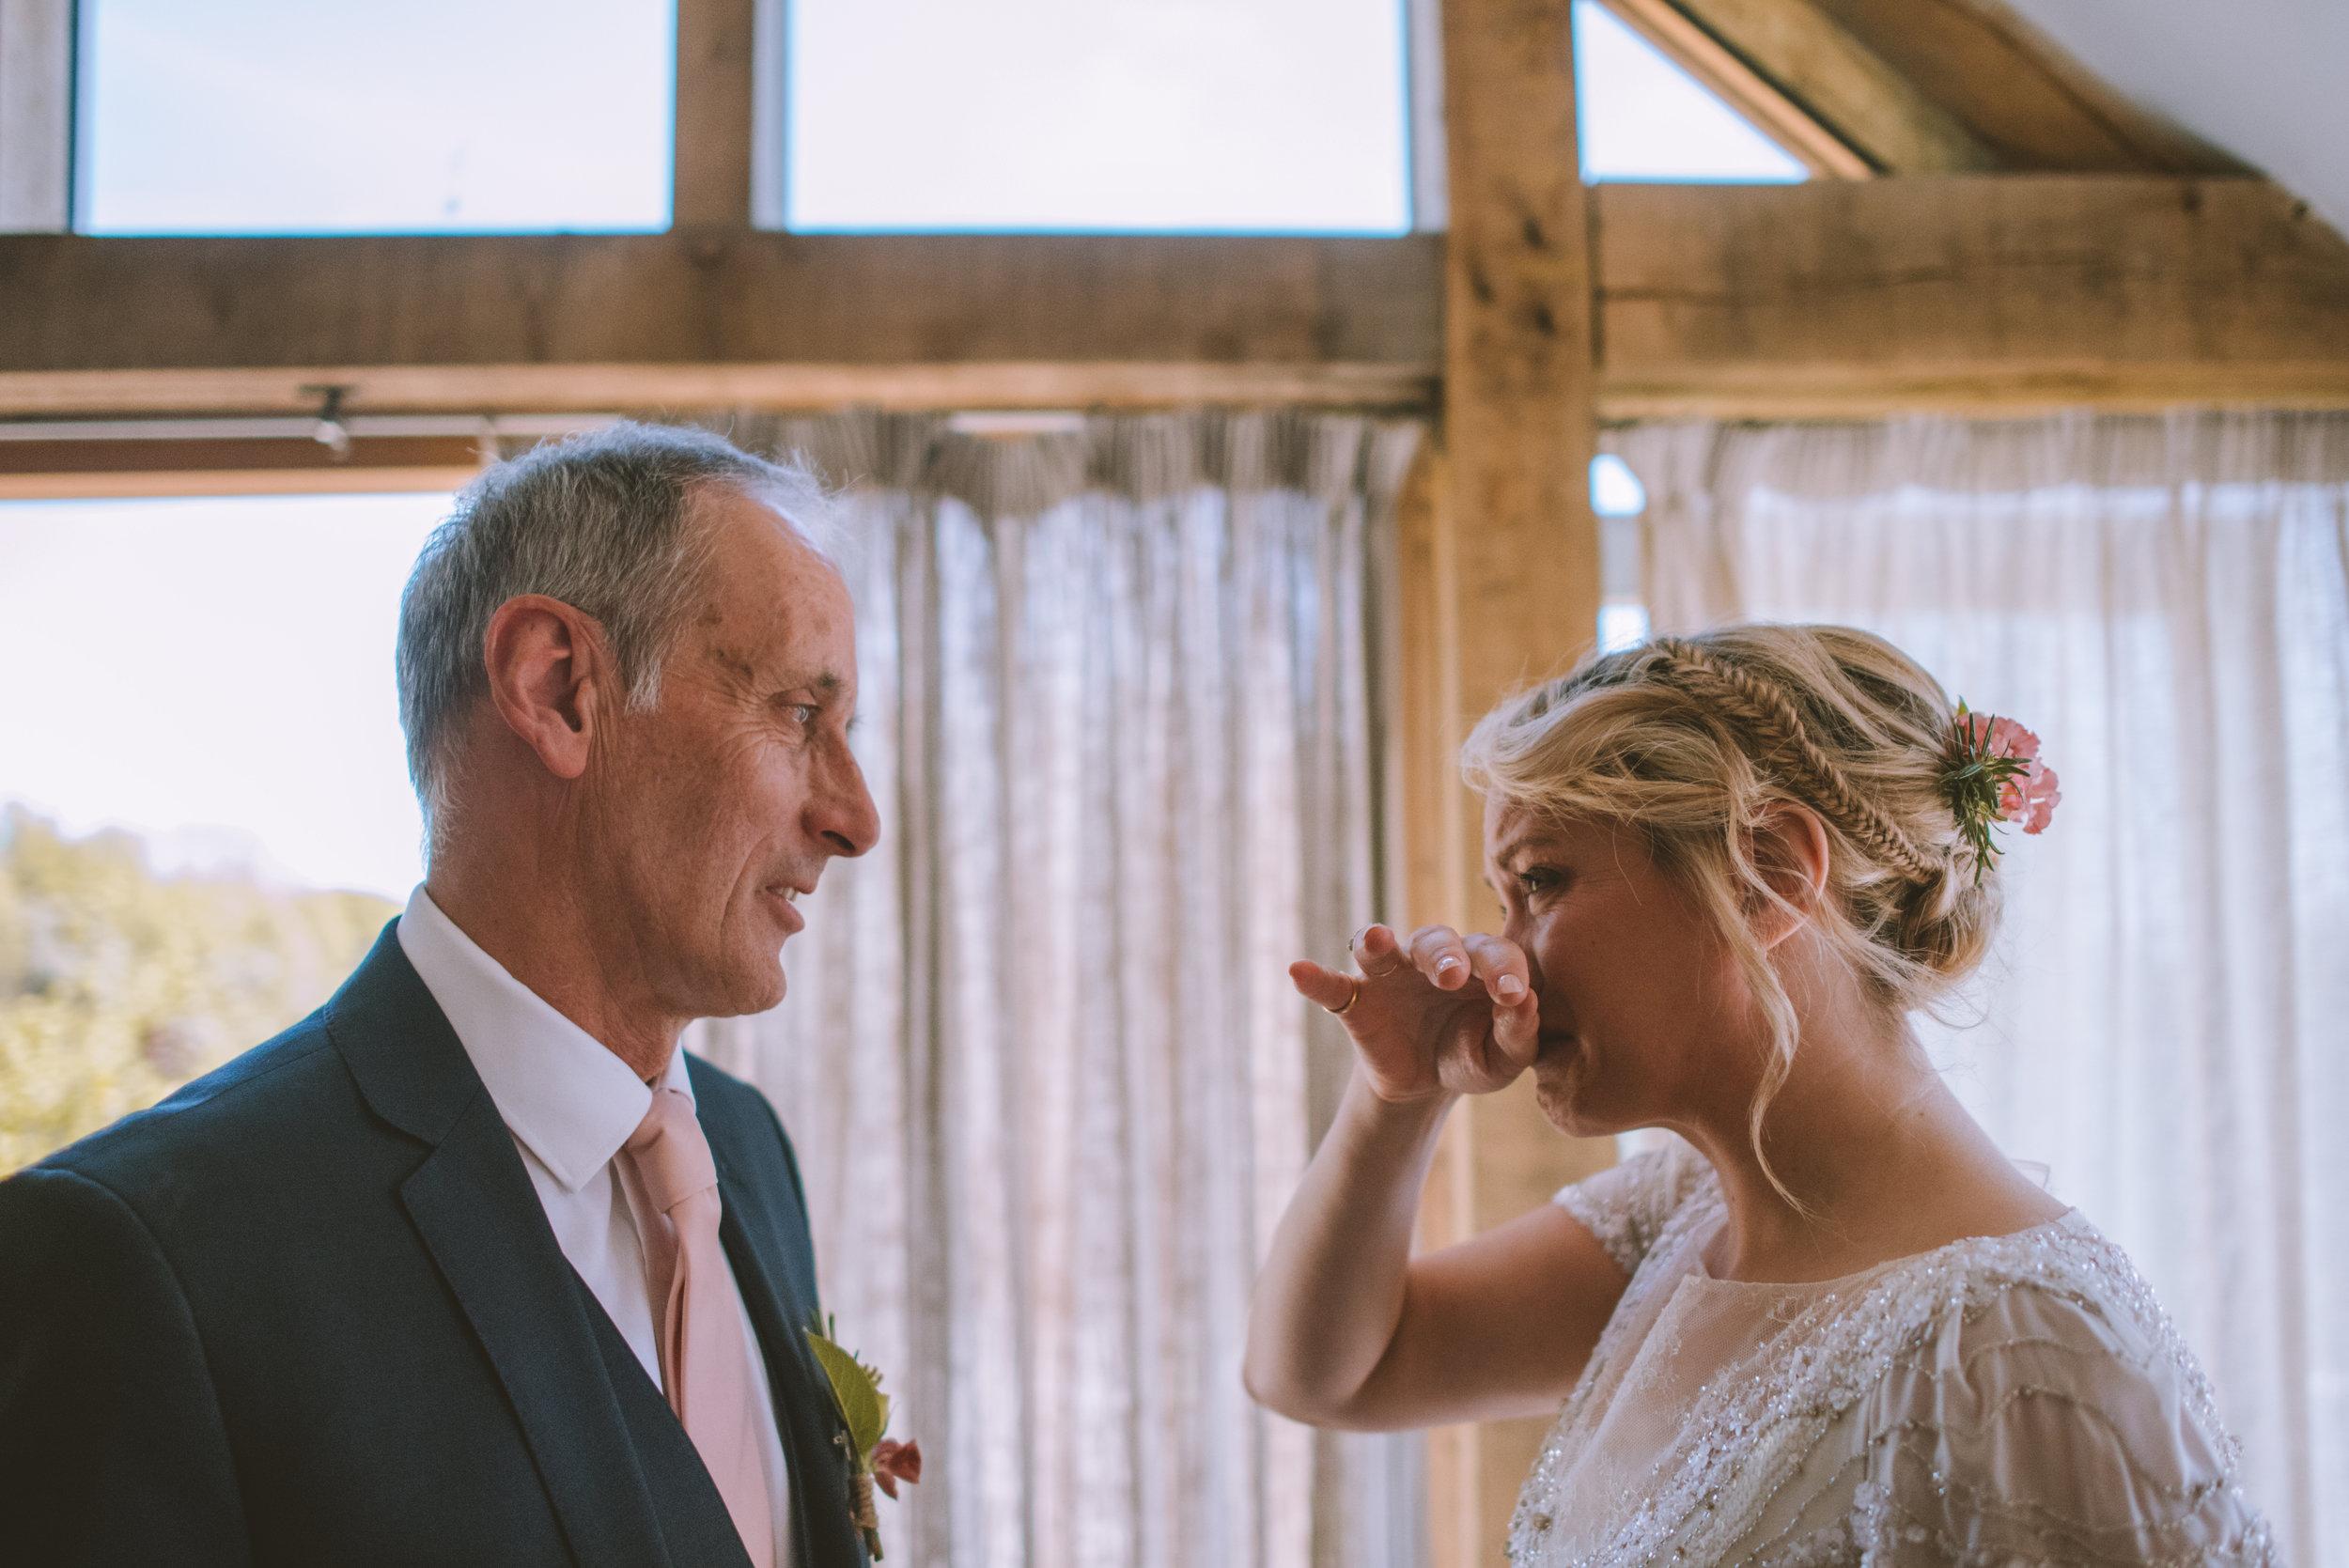 nancarrow-wedding-photography-25.jpg